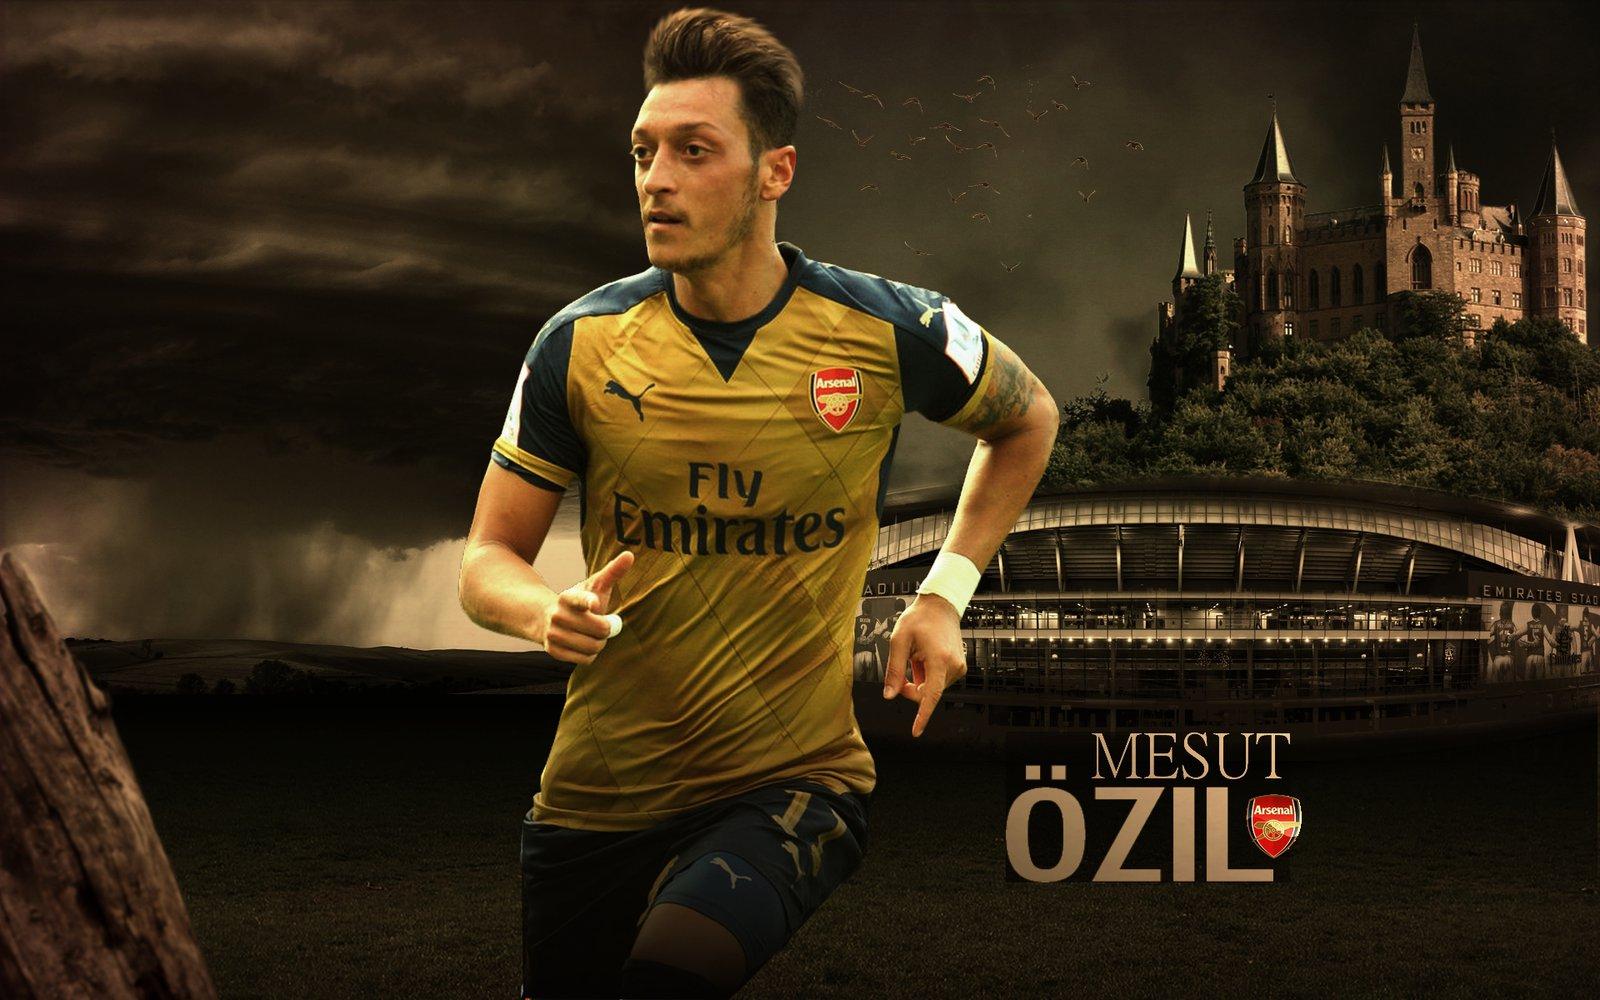 Mesut Ozil Wallpapers